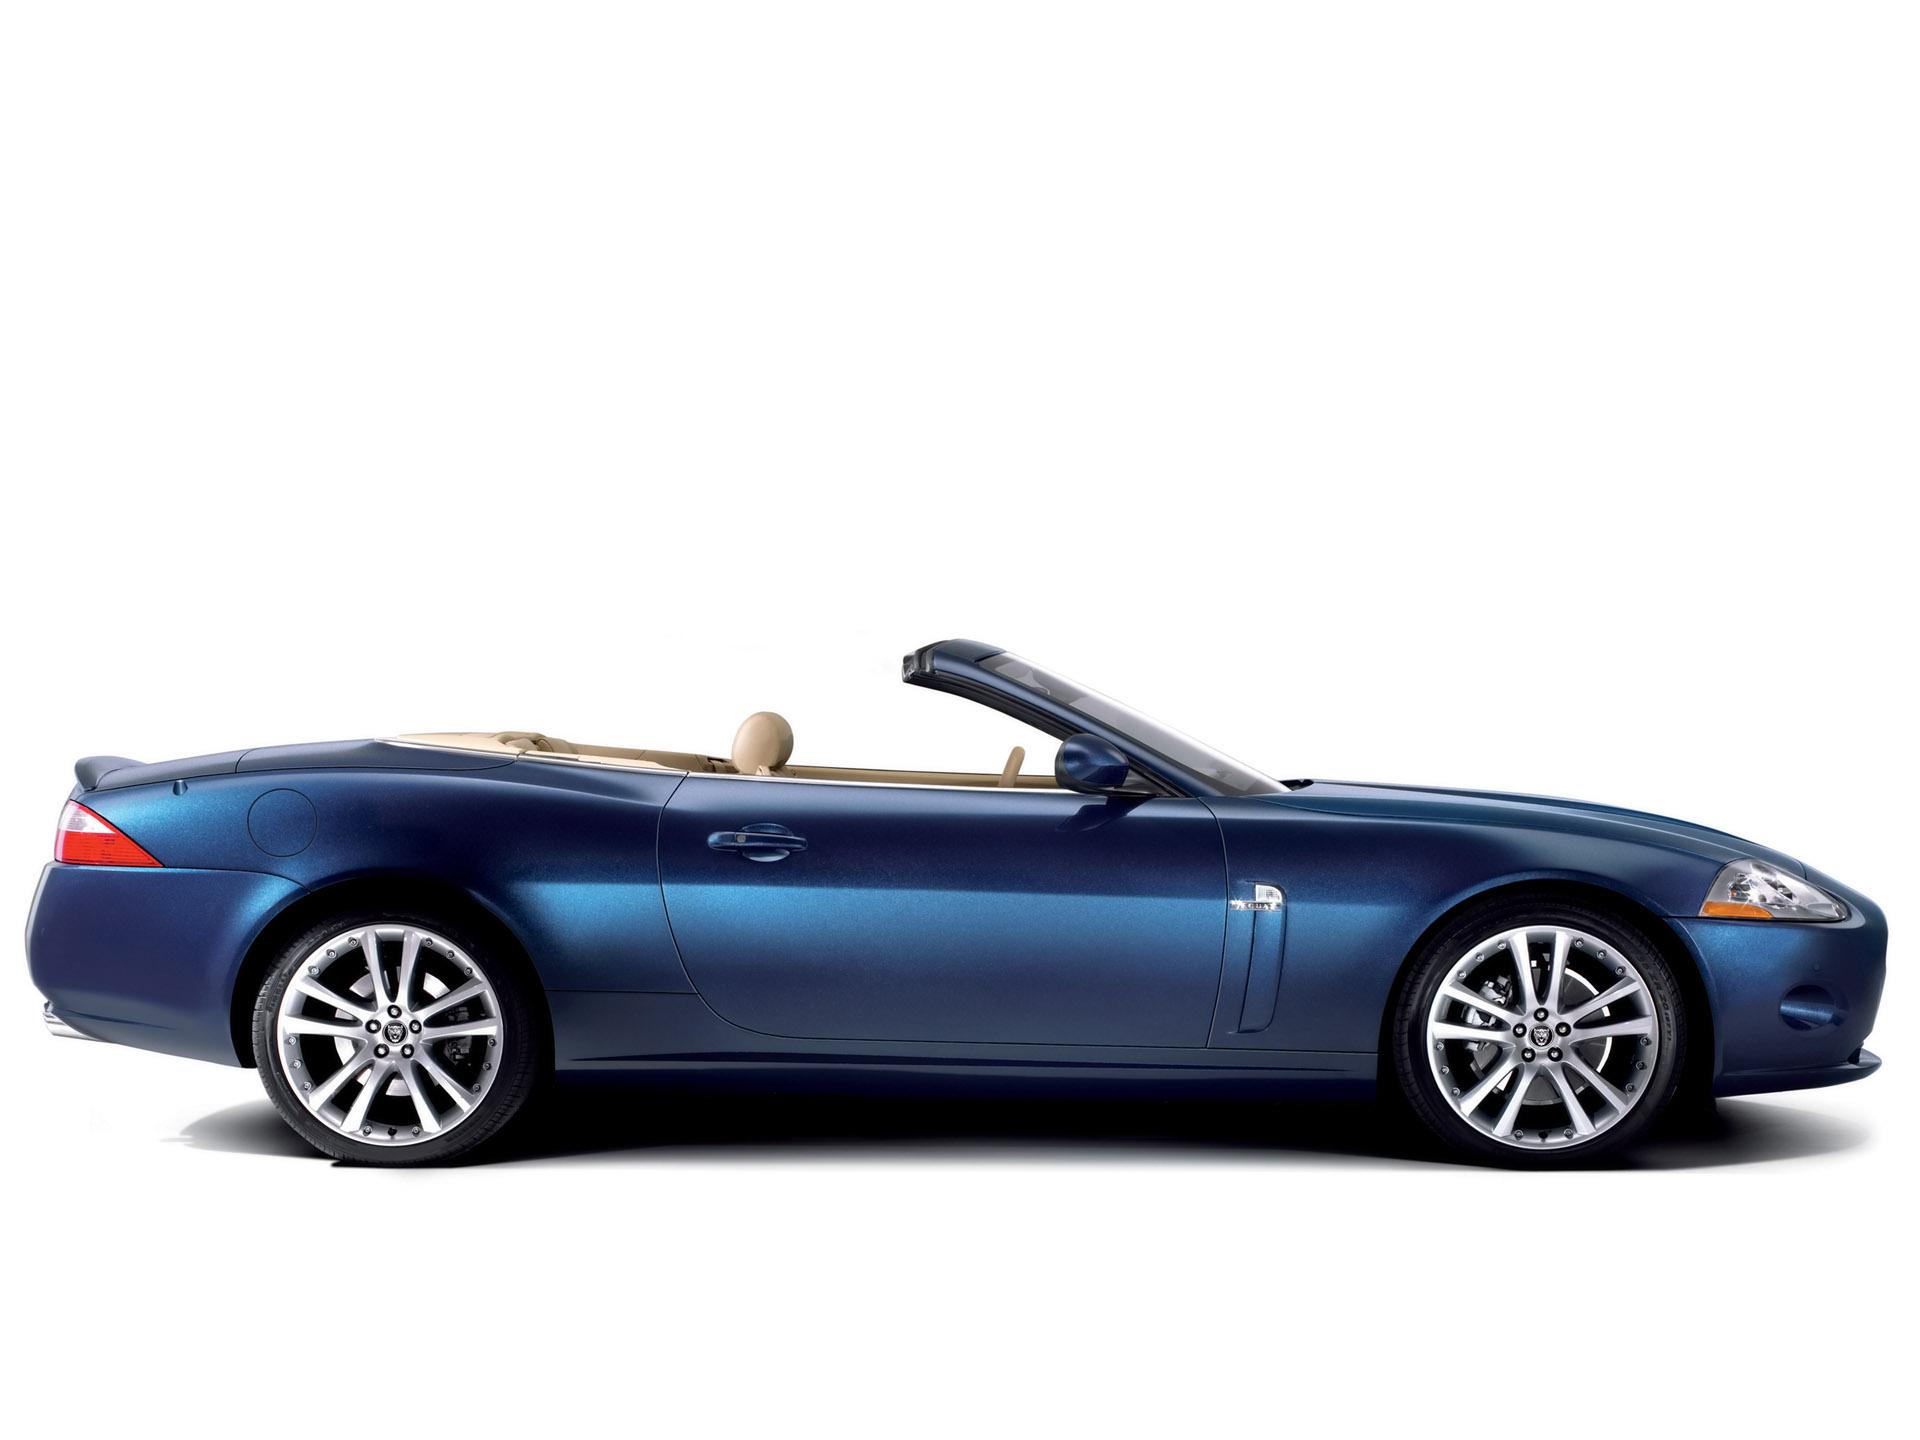 jaguar xk cabrio technical details history photos on better parts ltd. Black Bedroom Furniture Sets. Home Design Ideas